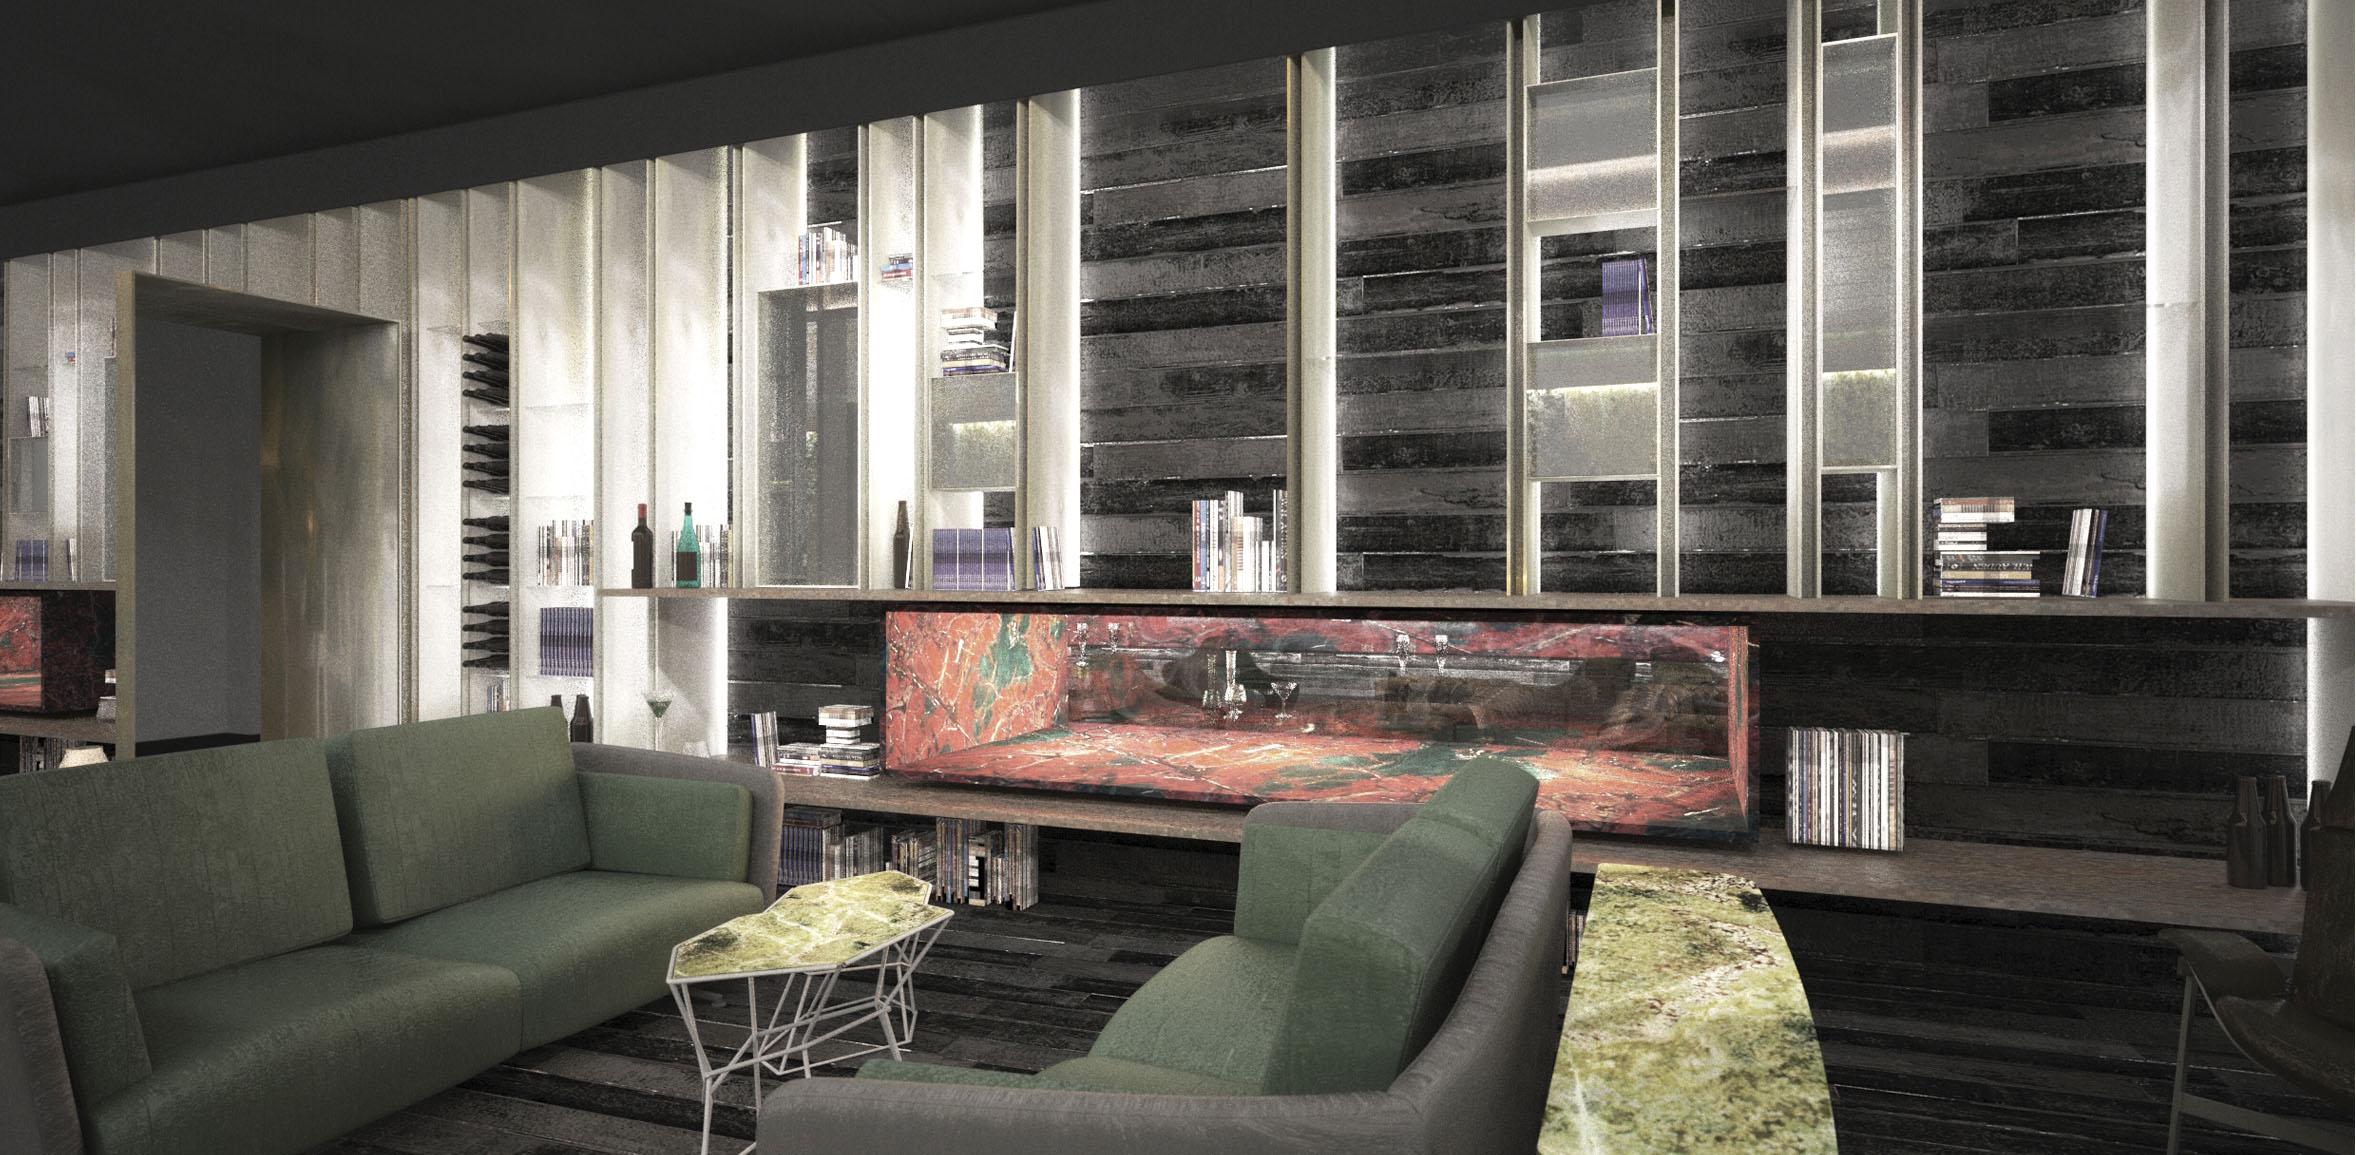 31_150715_legno+vetro+textures